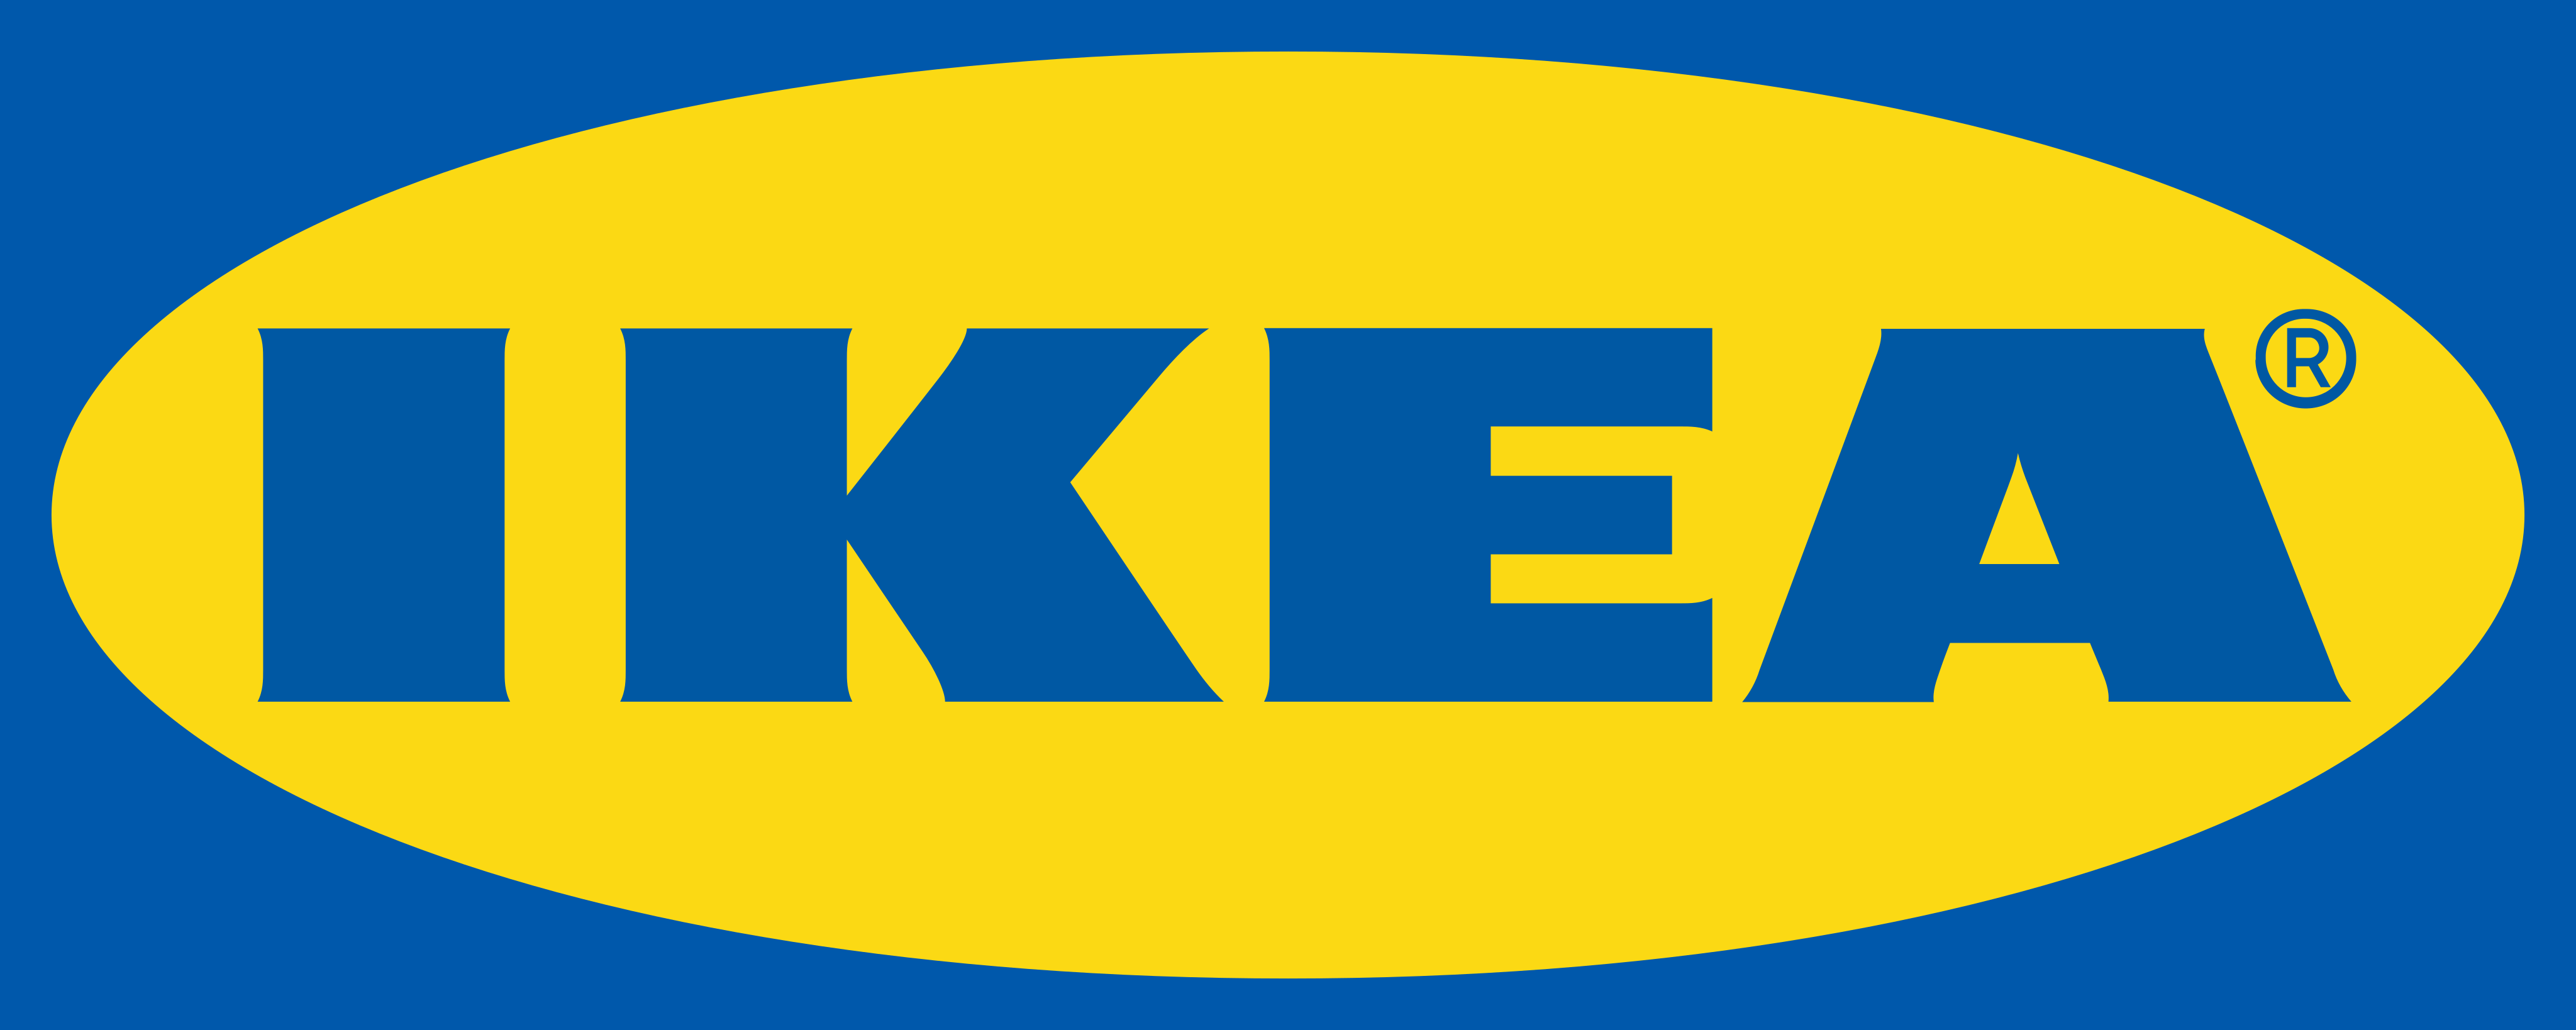 ikea logo 8 - IKEA Logo